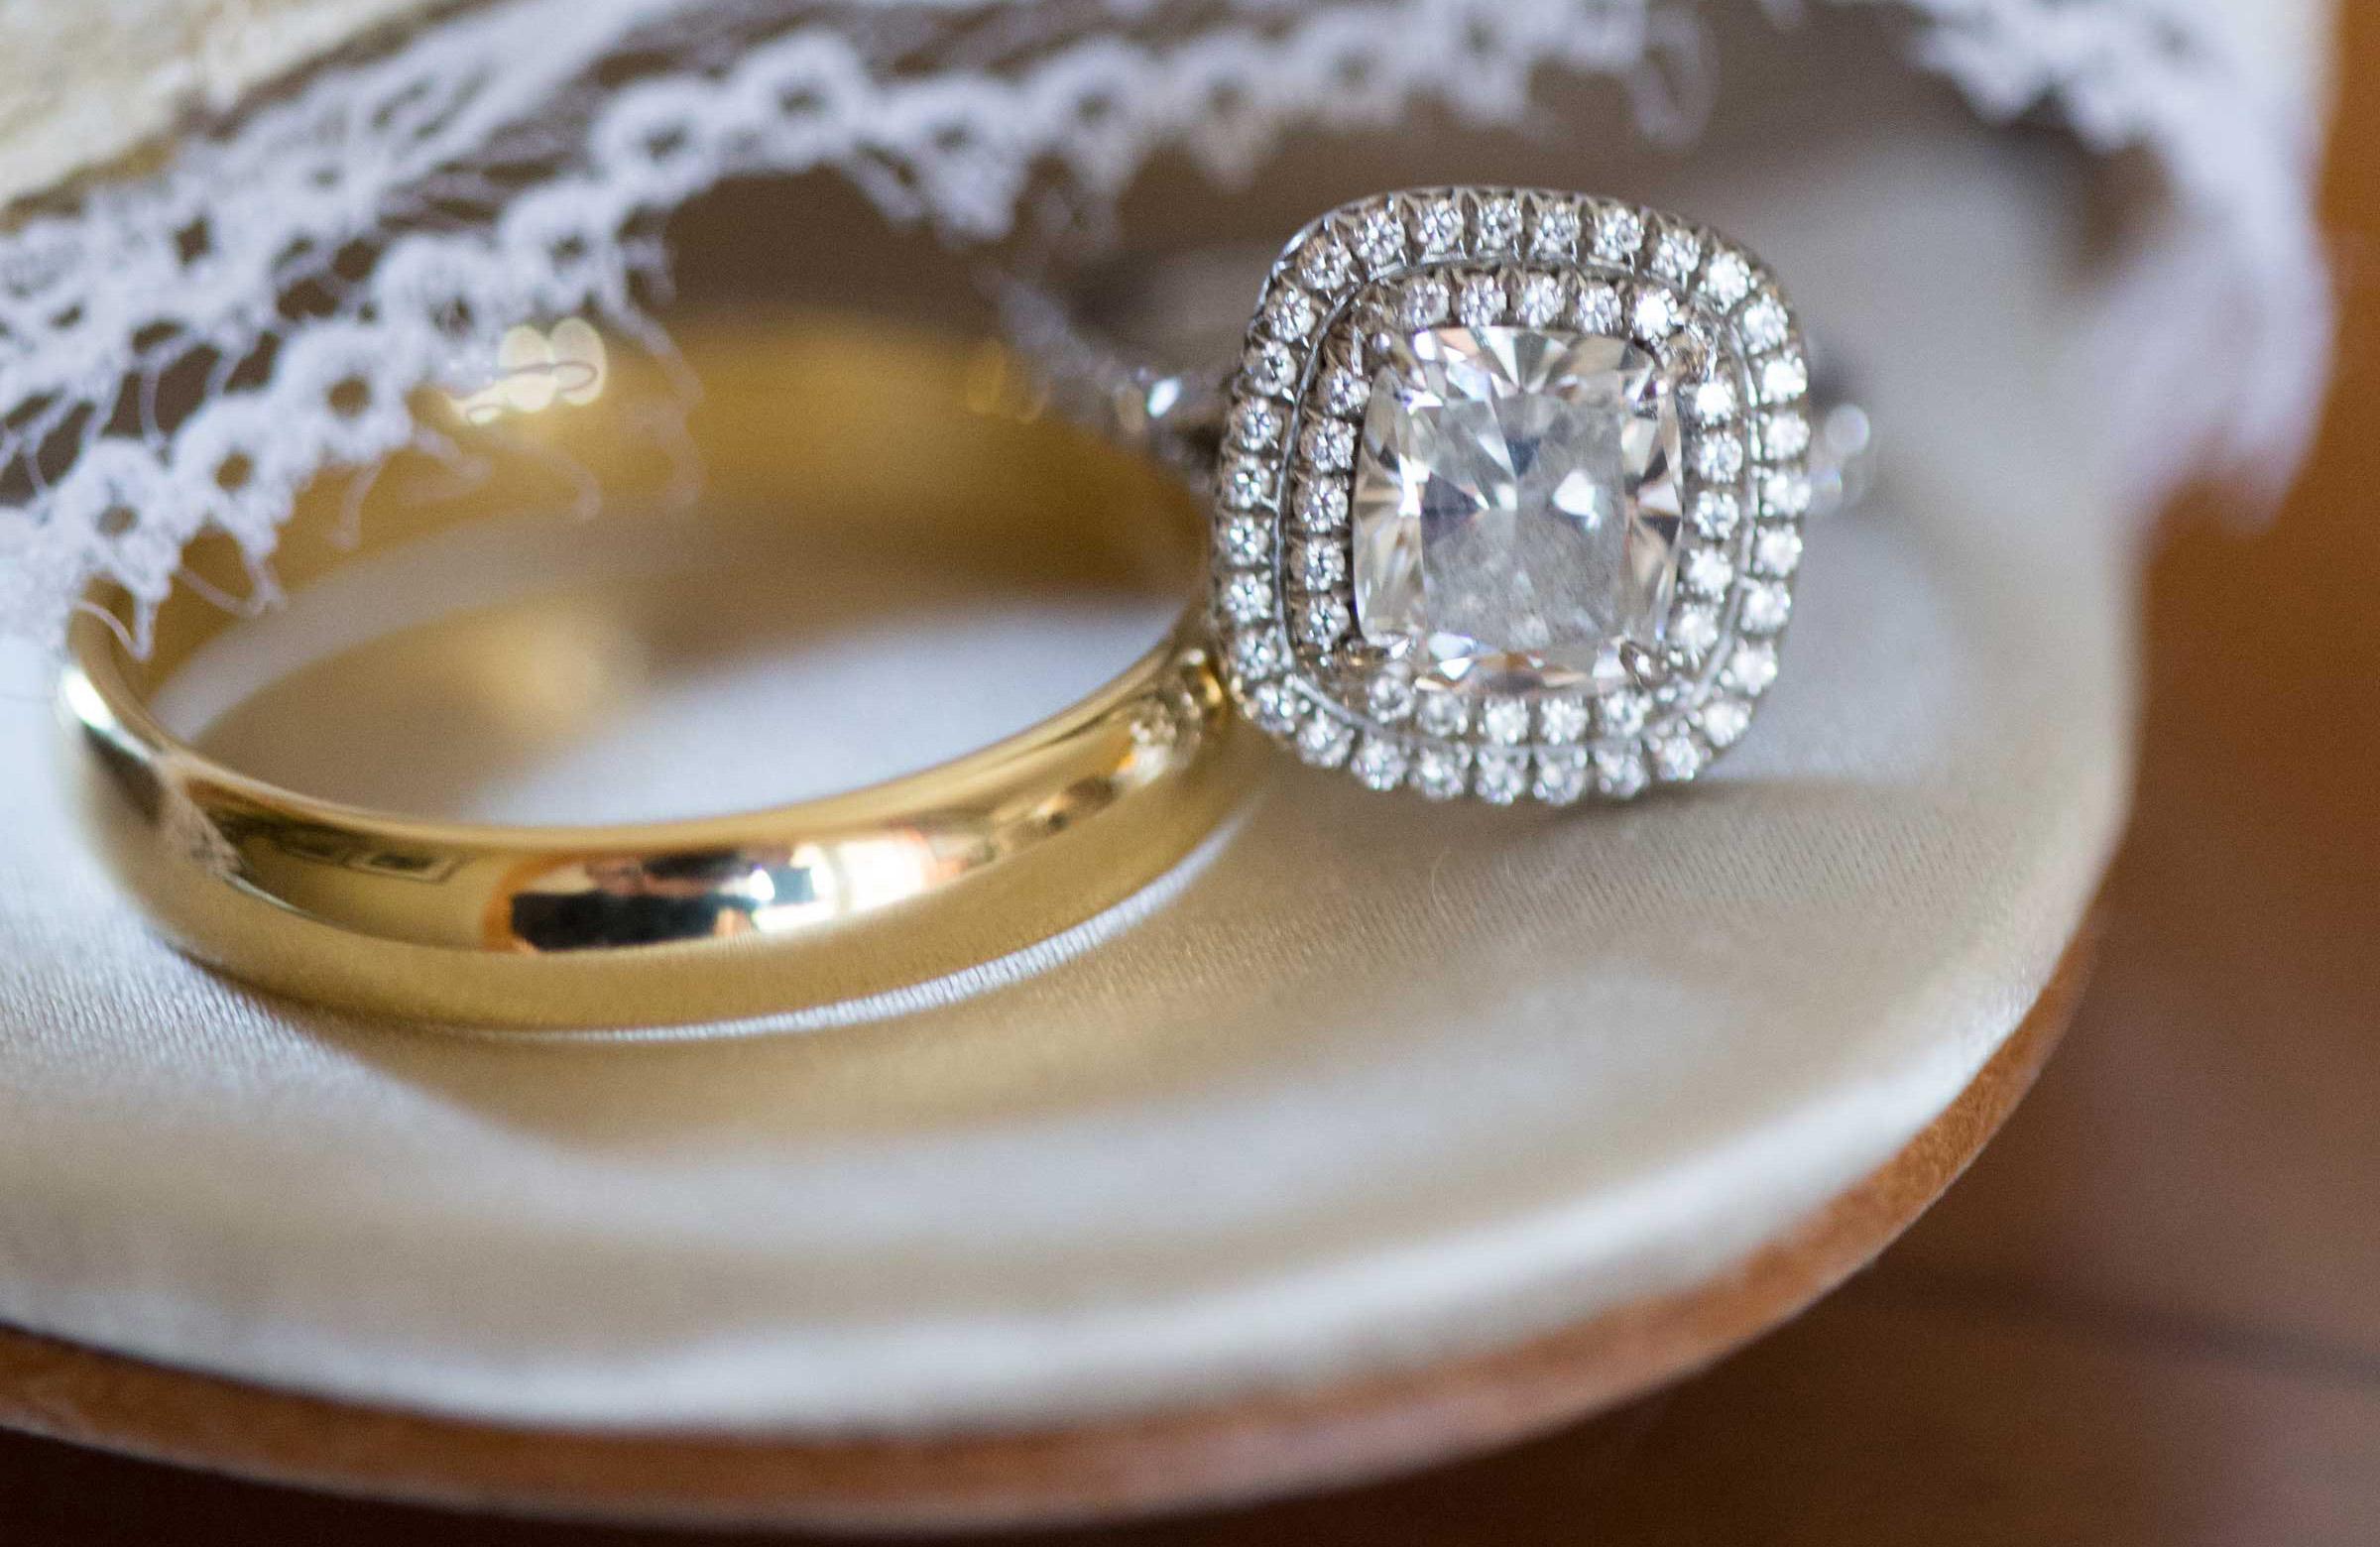 double halo cushion cut diamond ring, pippa middleton engagement ring inspiration